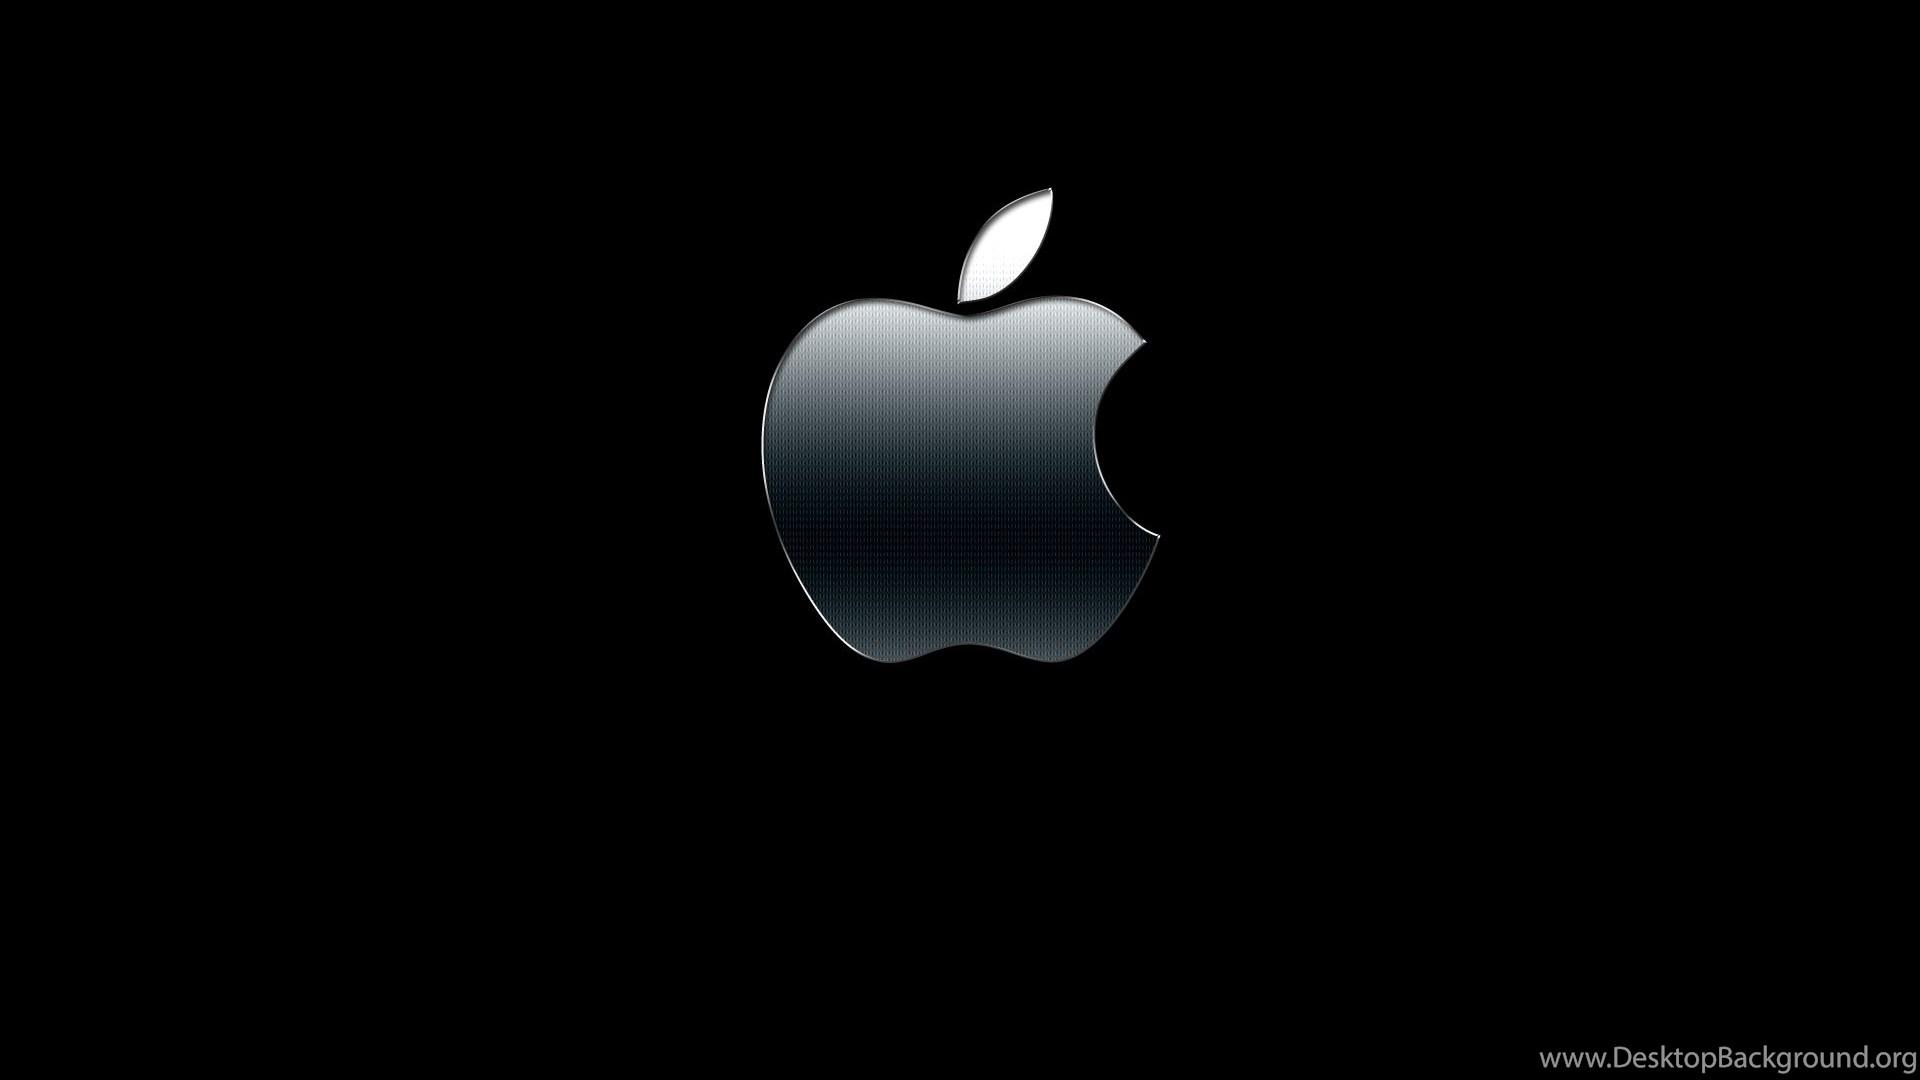 cool wallpapers apple live wallpapers hd for windows 7 desktop